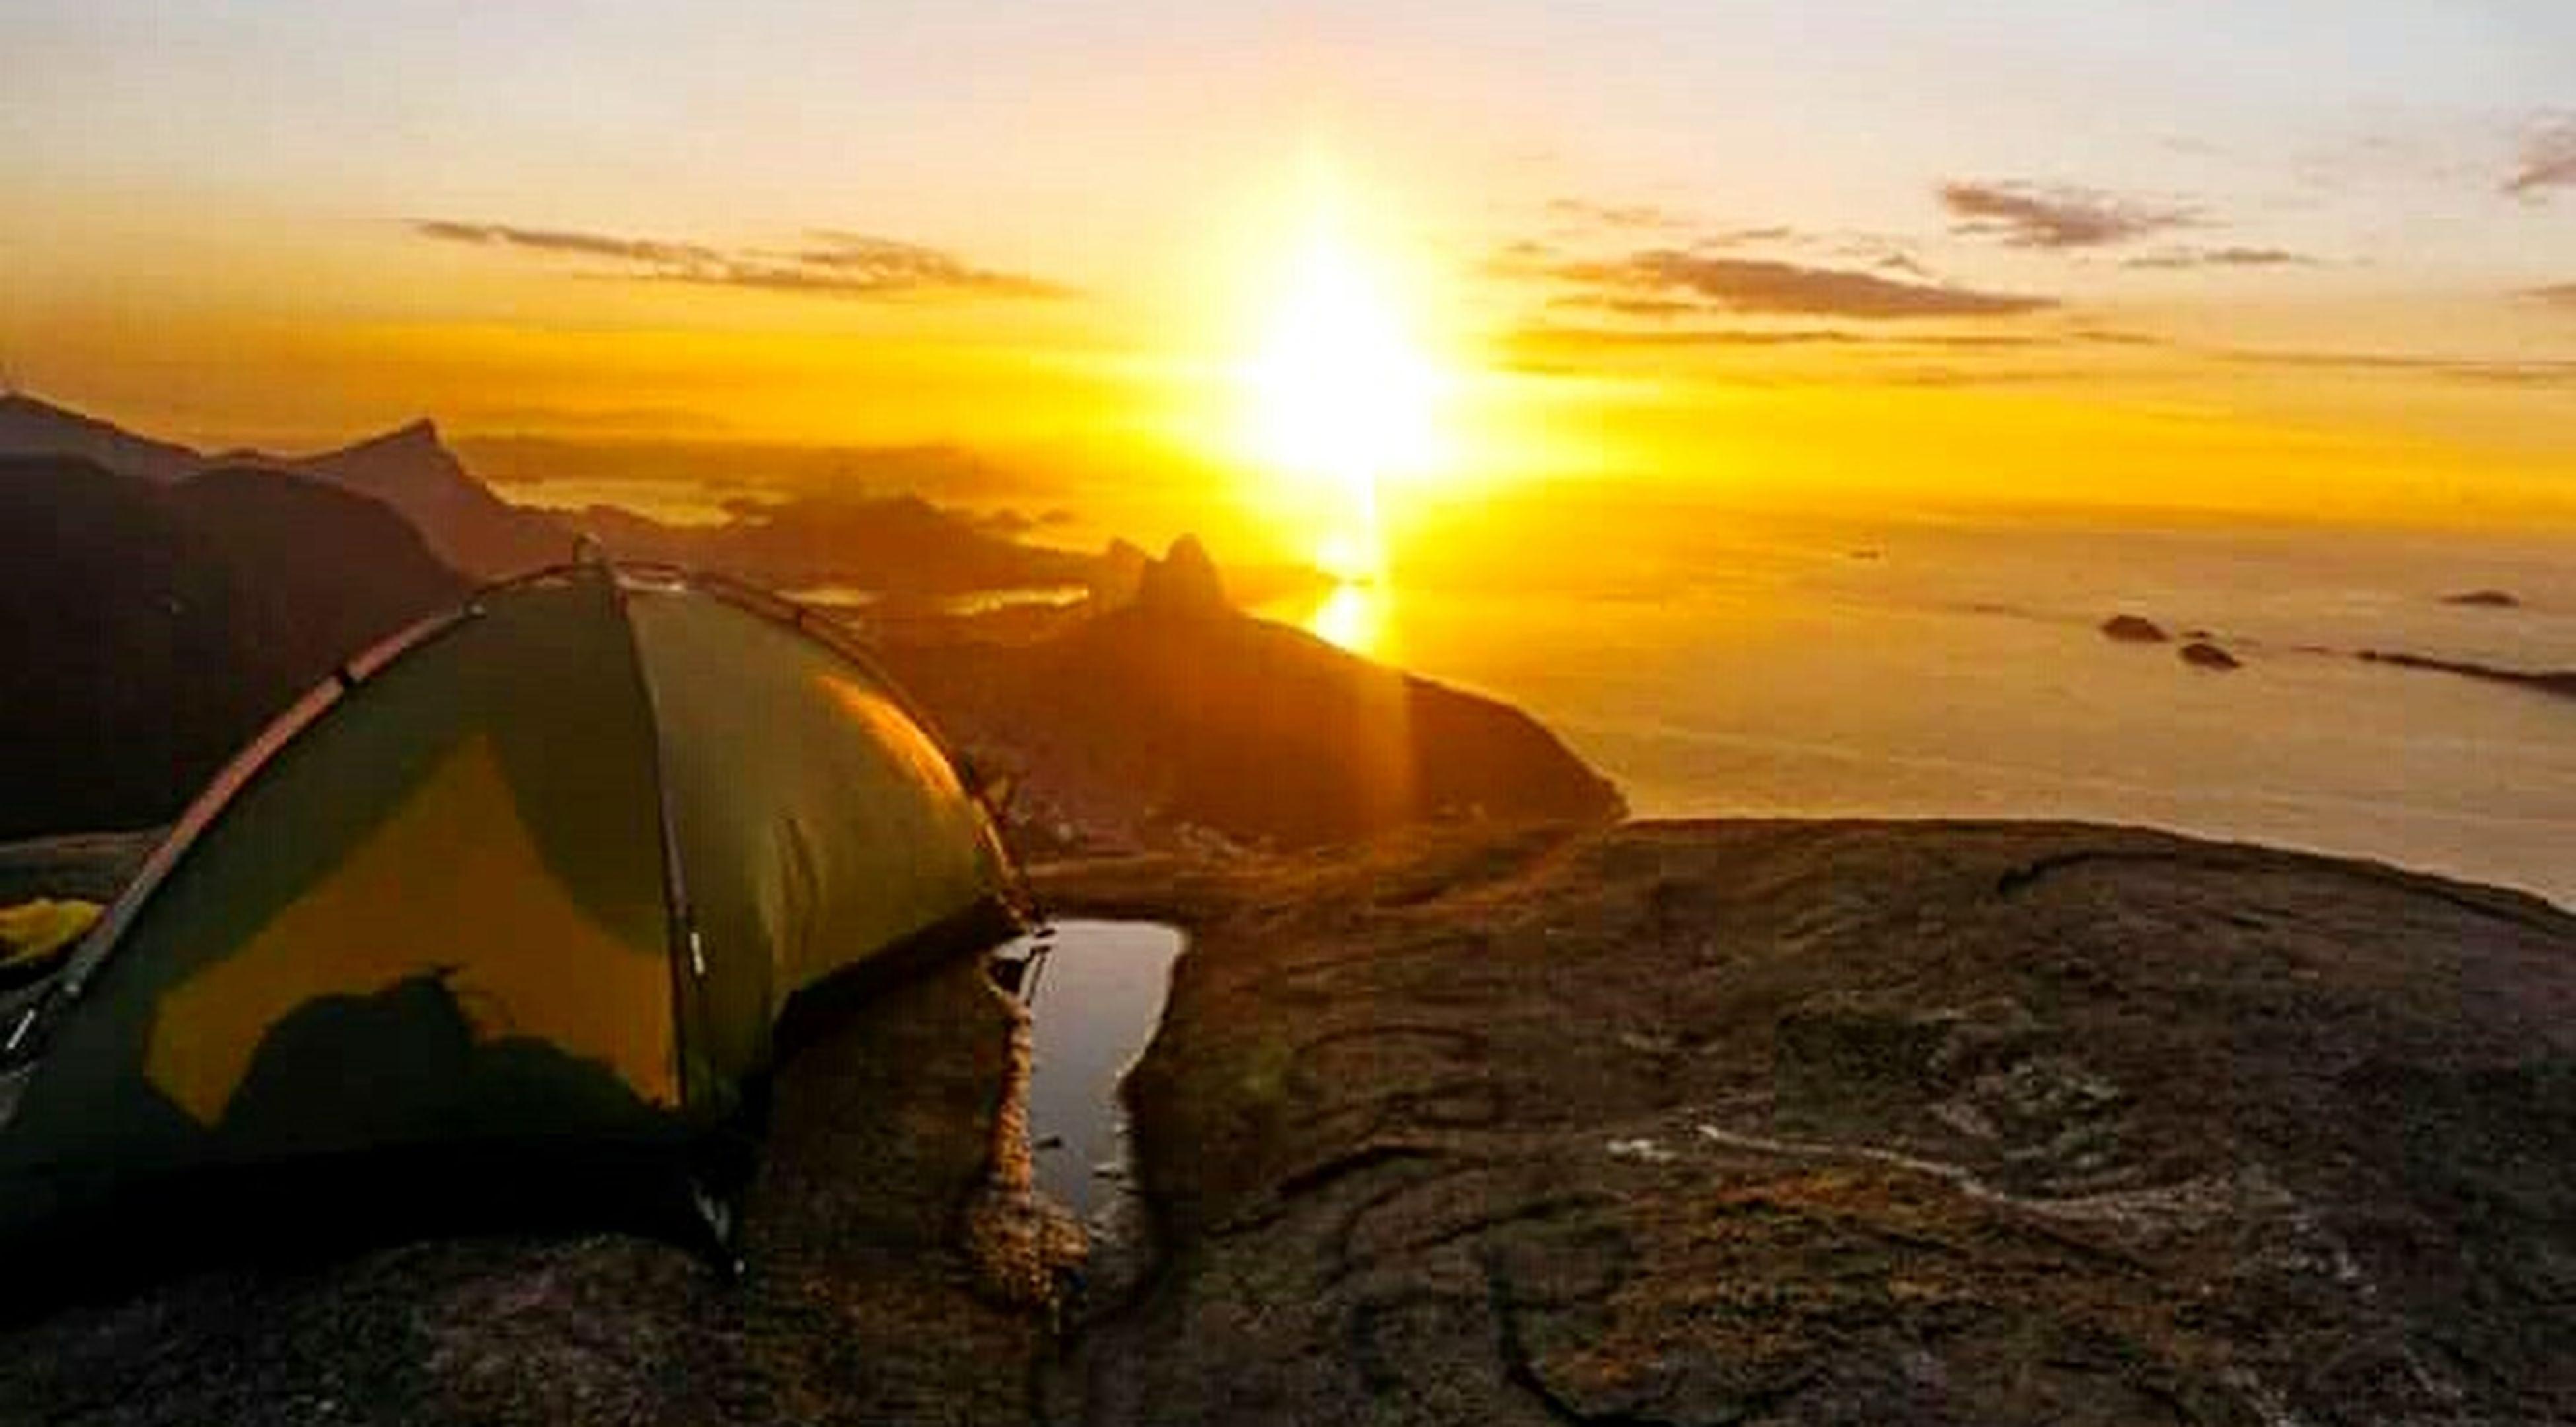 sunset, sunlight, sun, nature, beauty in nature, sky, water, landscape, sunbeam, scenics, outdoors, no people, sea, day